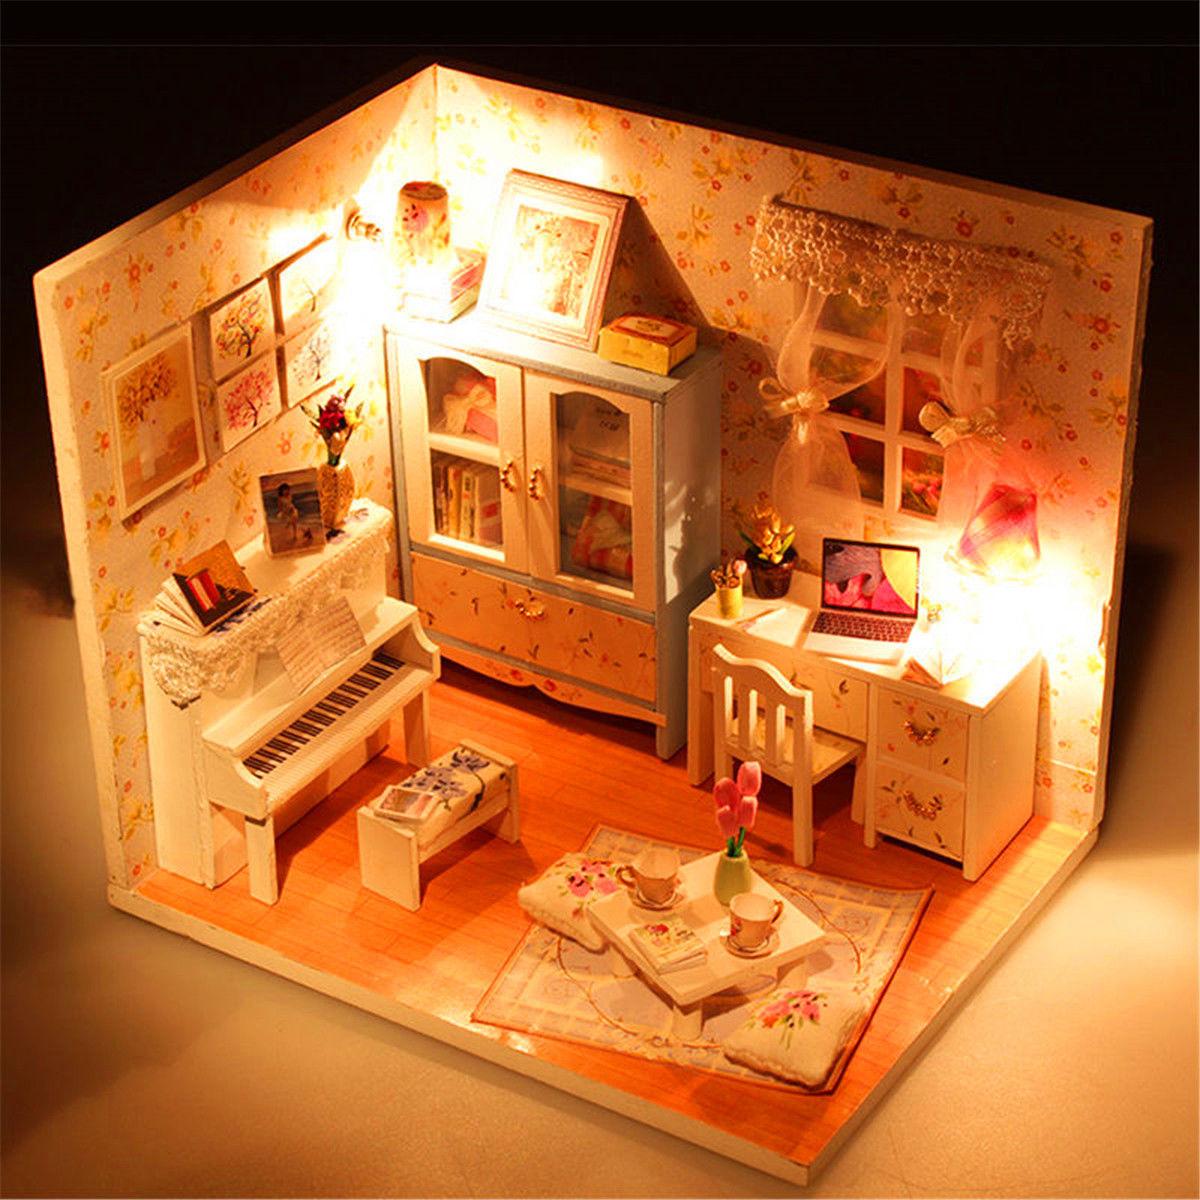 comparison of dollhouse to aristotelian views